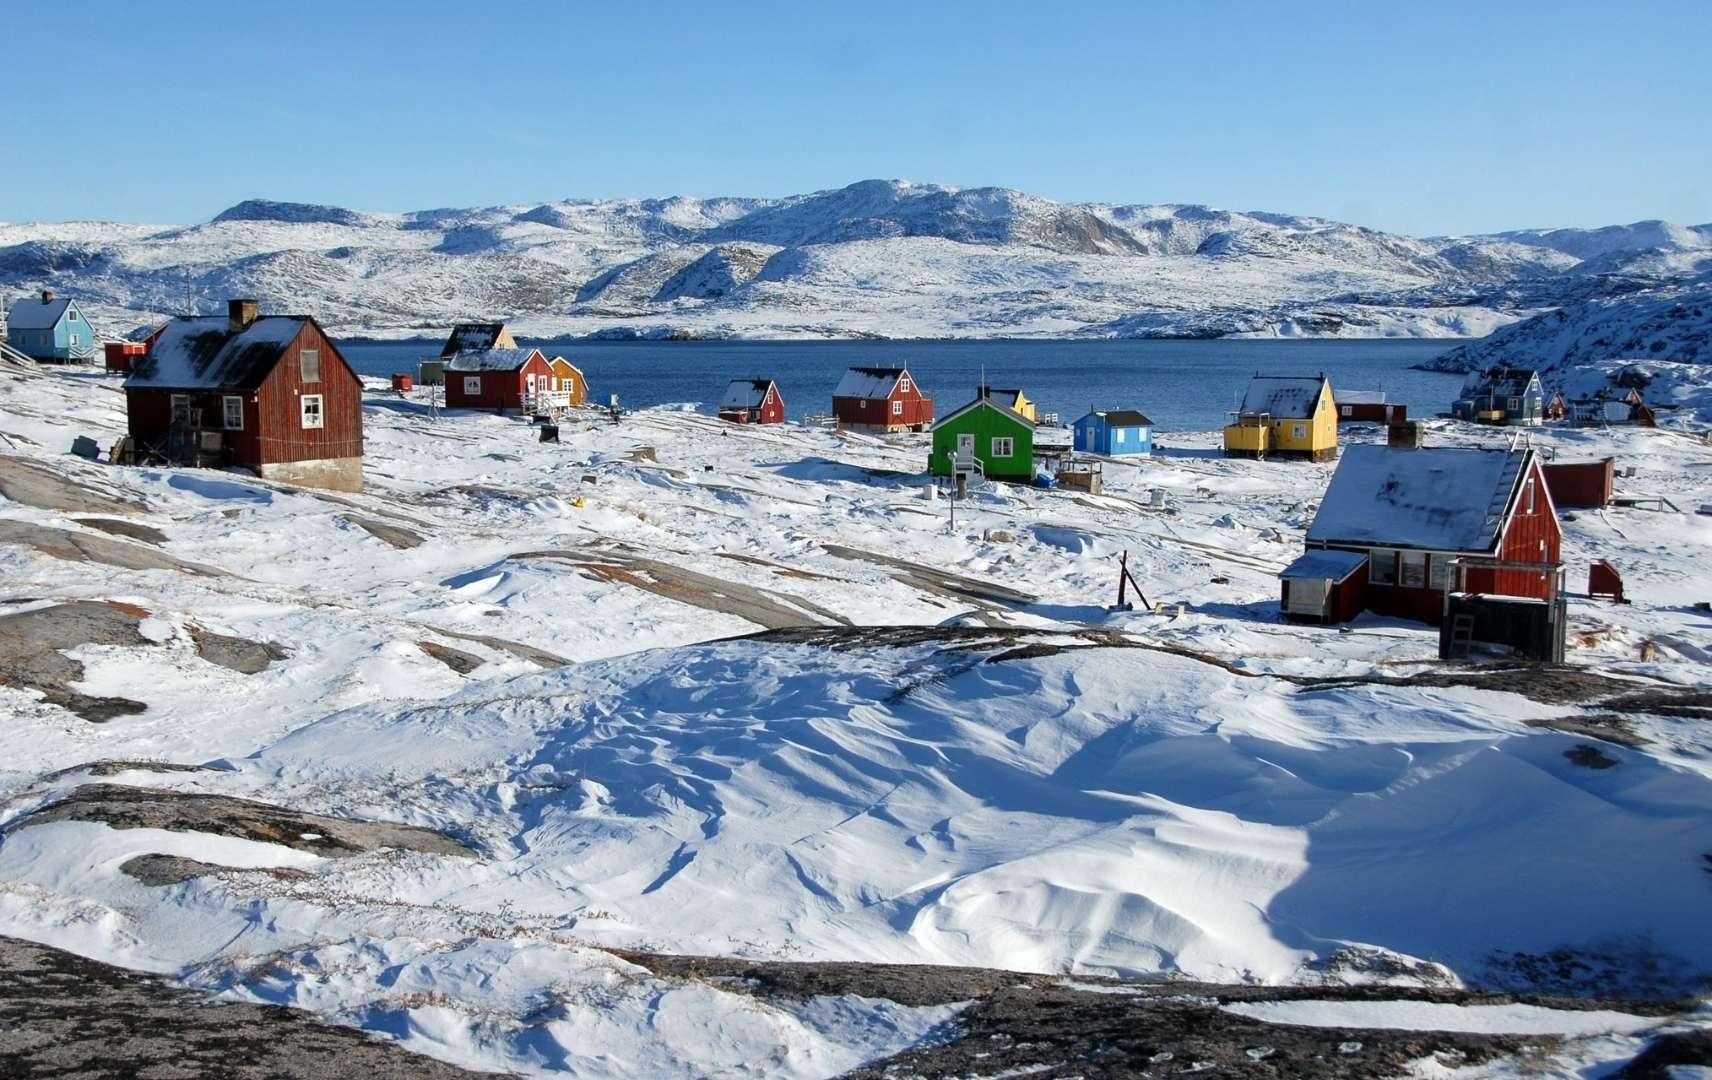 Rodebay in Grönland